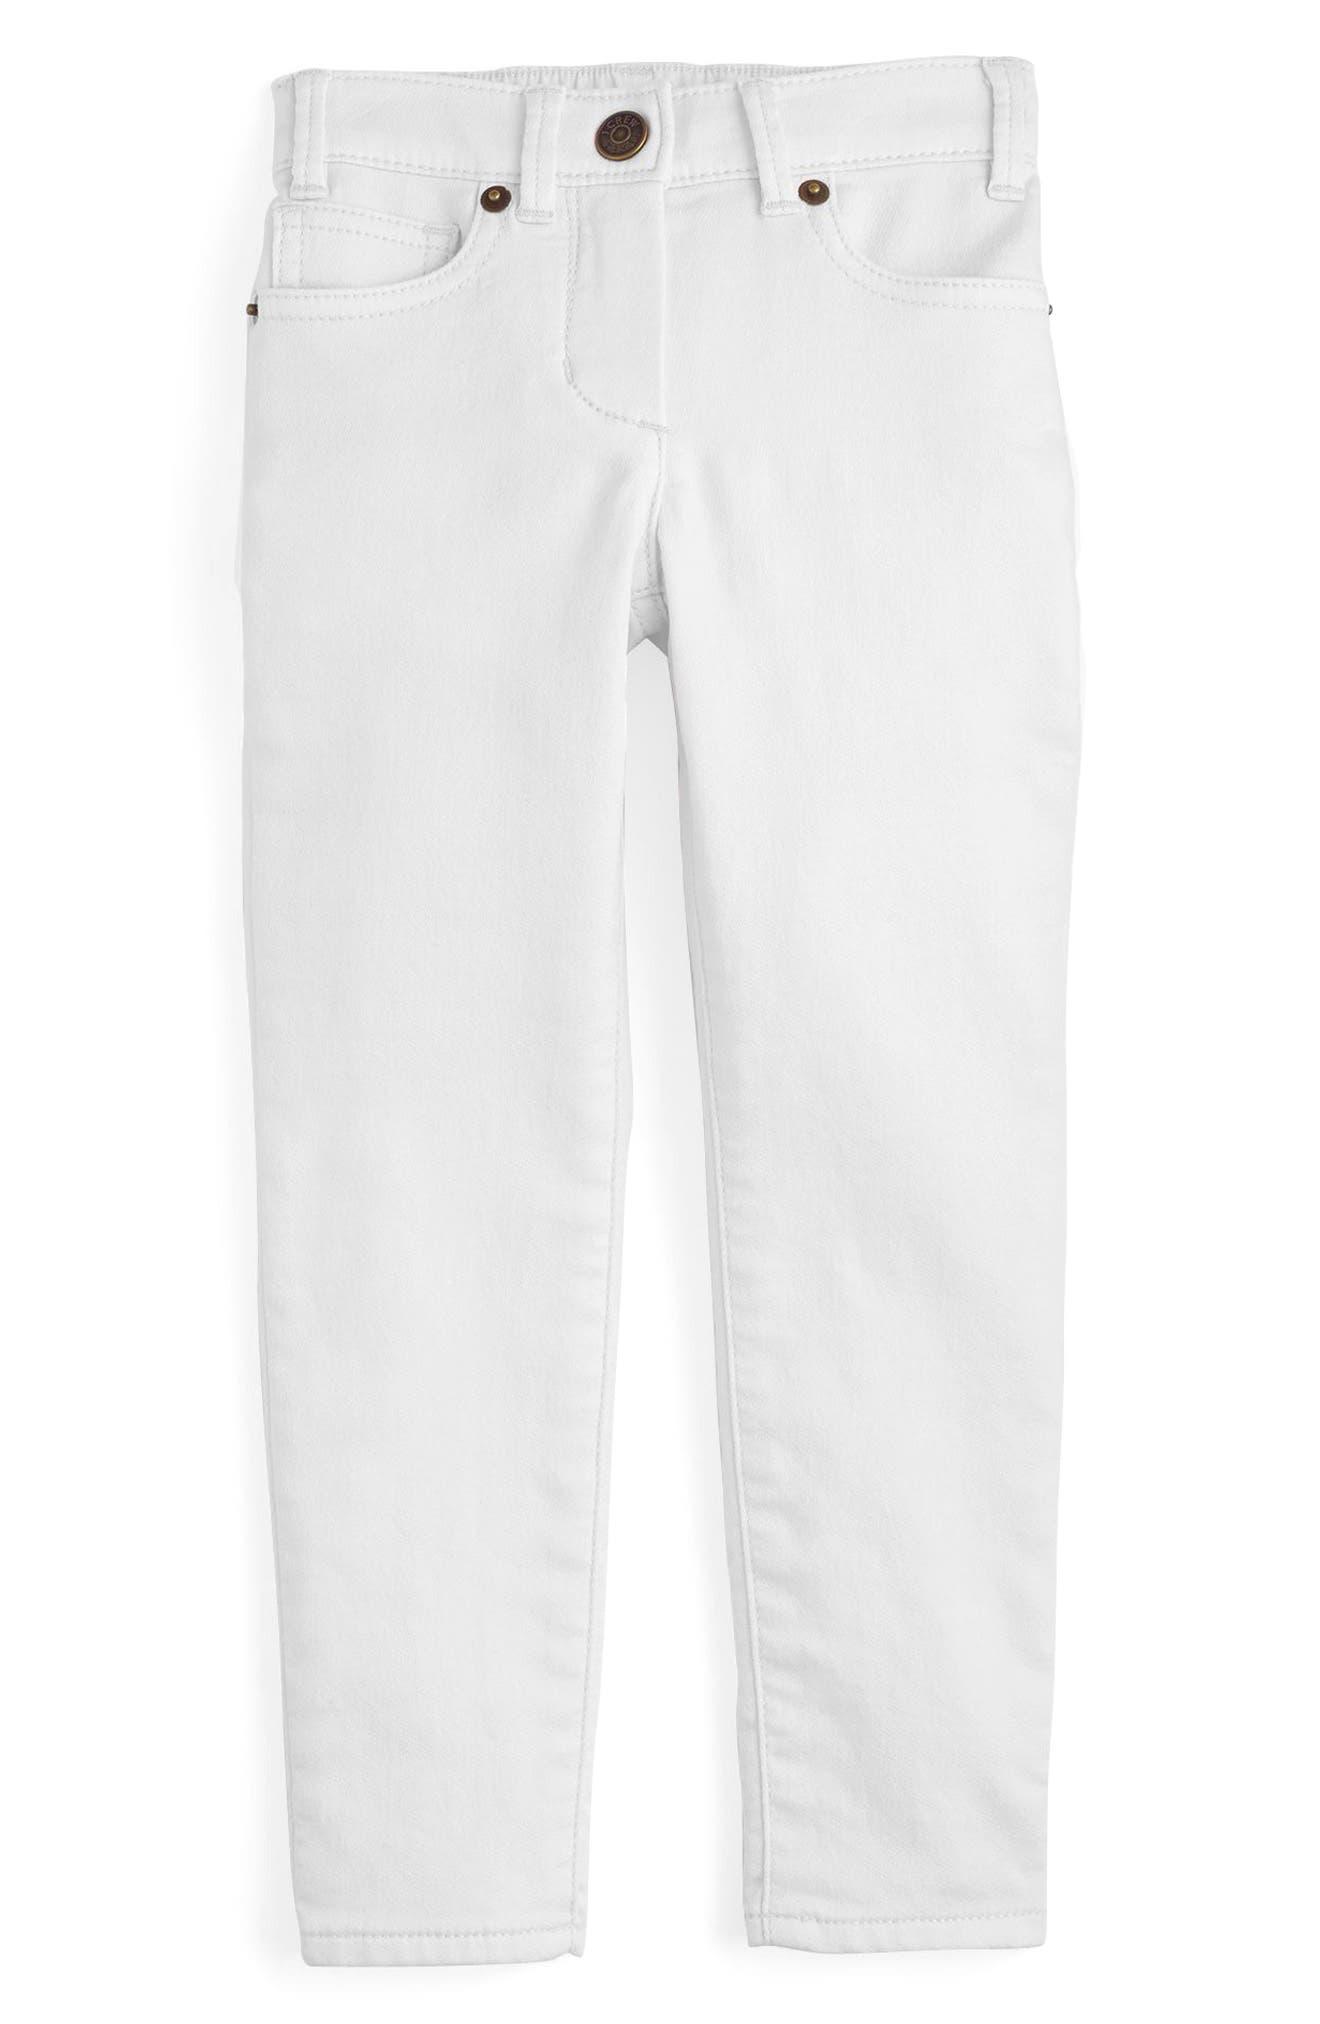 Runaround Garment Dye Jeans,                             Main thumbnail 1, color,                             White